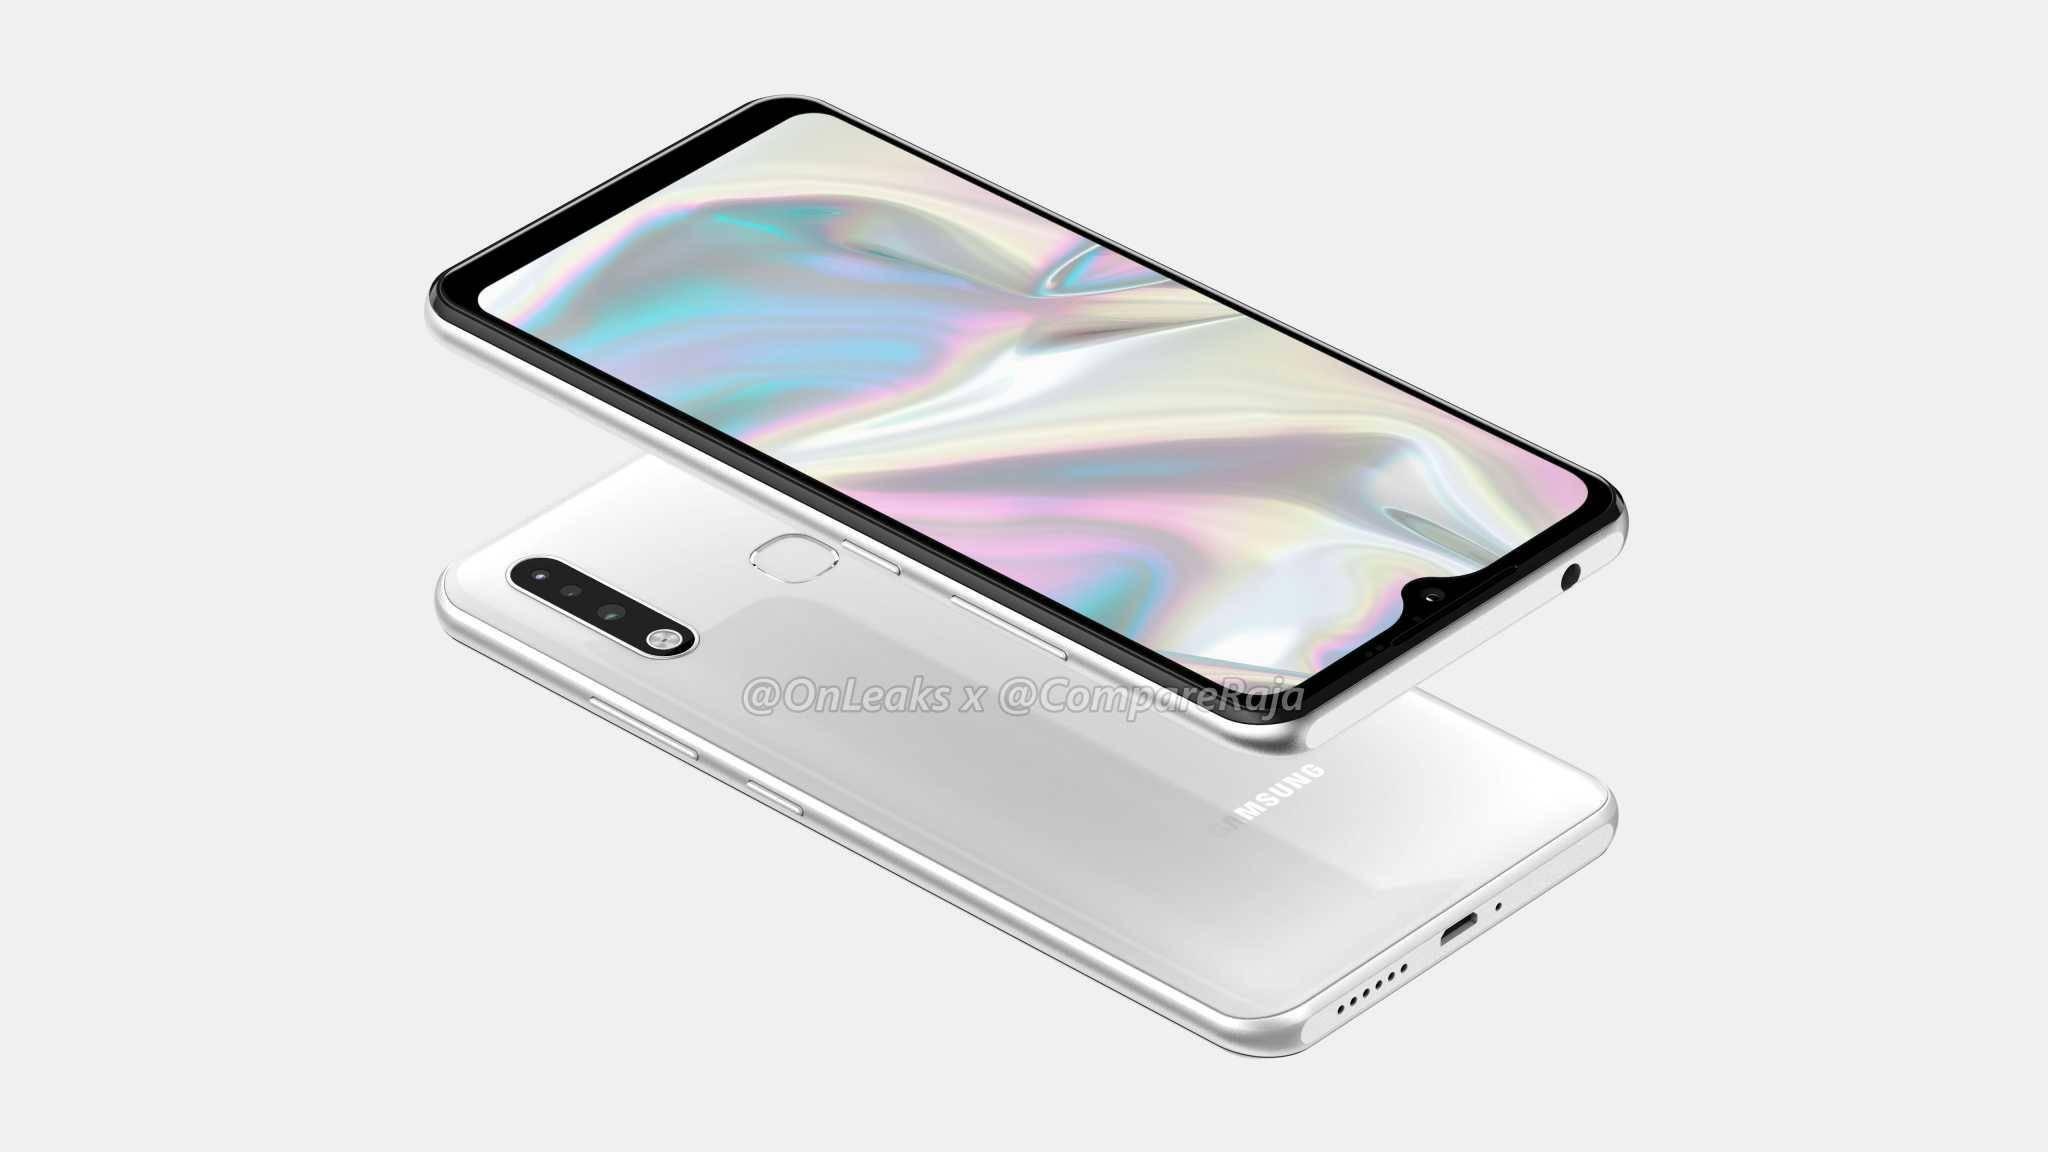 Beim nächsten Einsteiger-Modell der Galaxy-A-Serie hält Samsung am Micro-USB-Port fest.